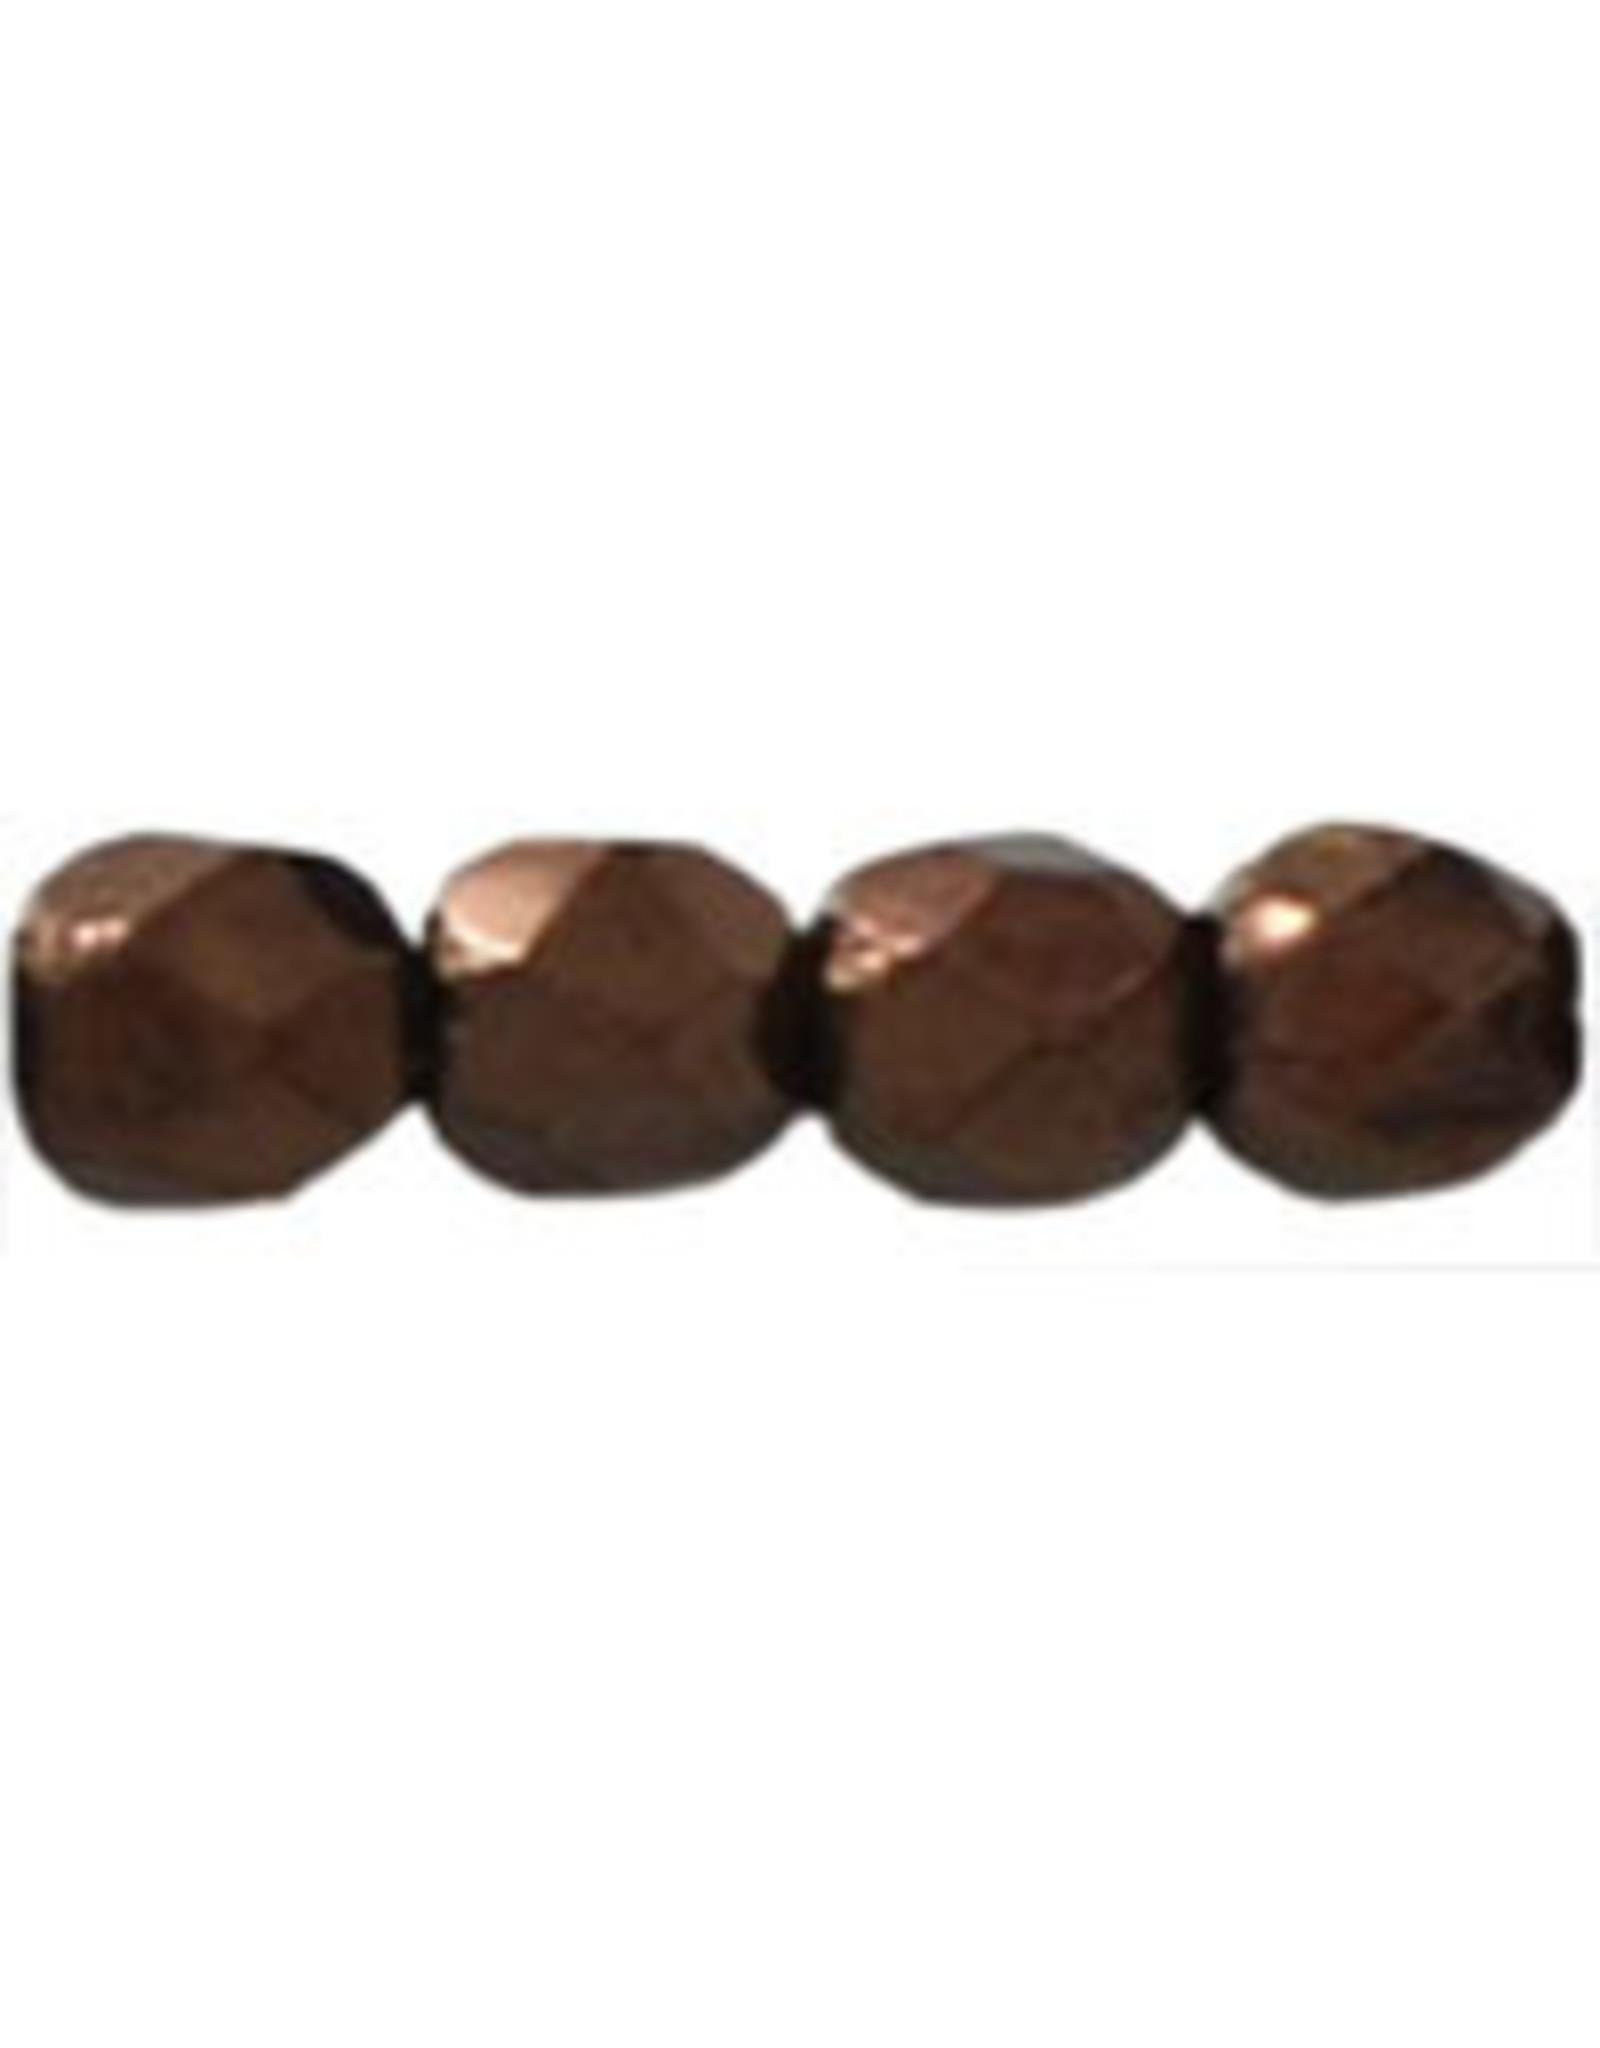 Czech 3mm Fire Polish Chocolate Brown Metallic  x50